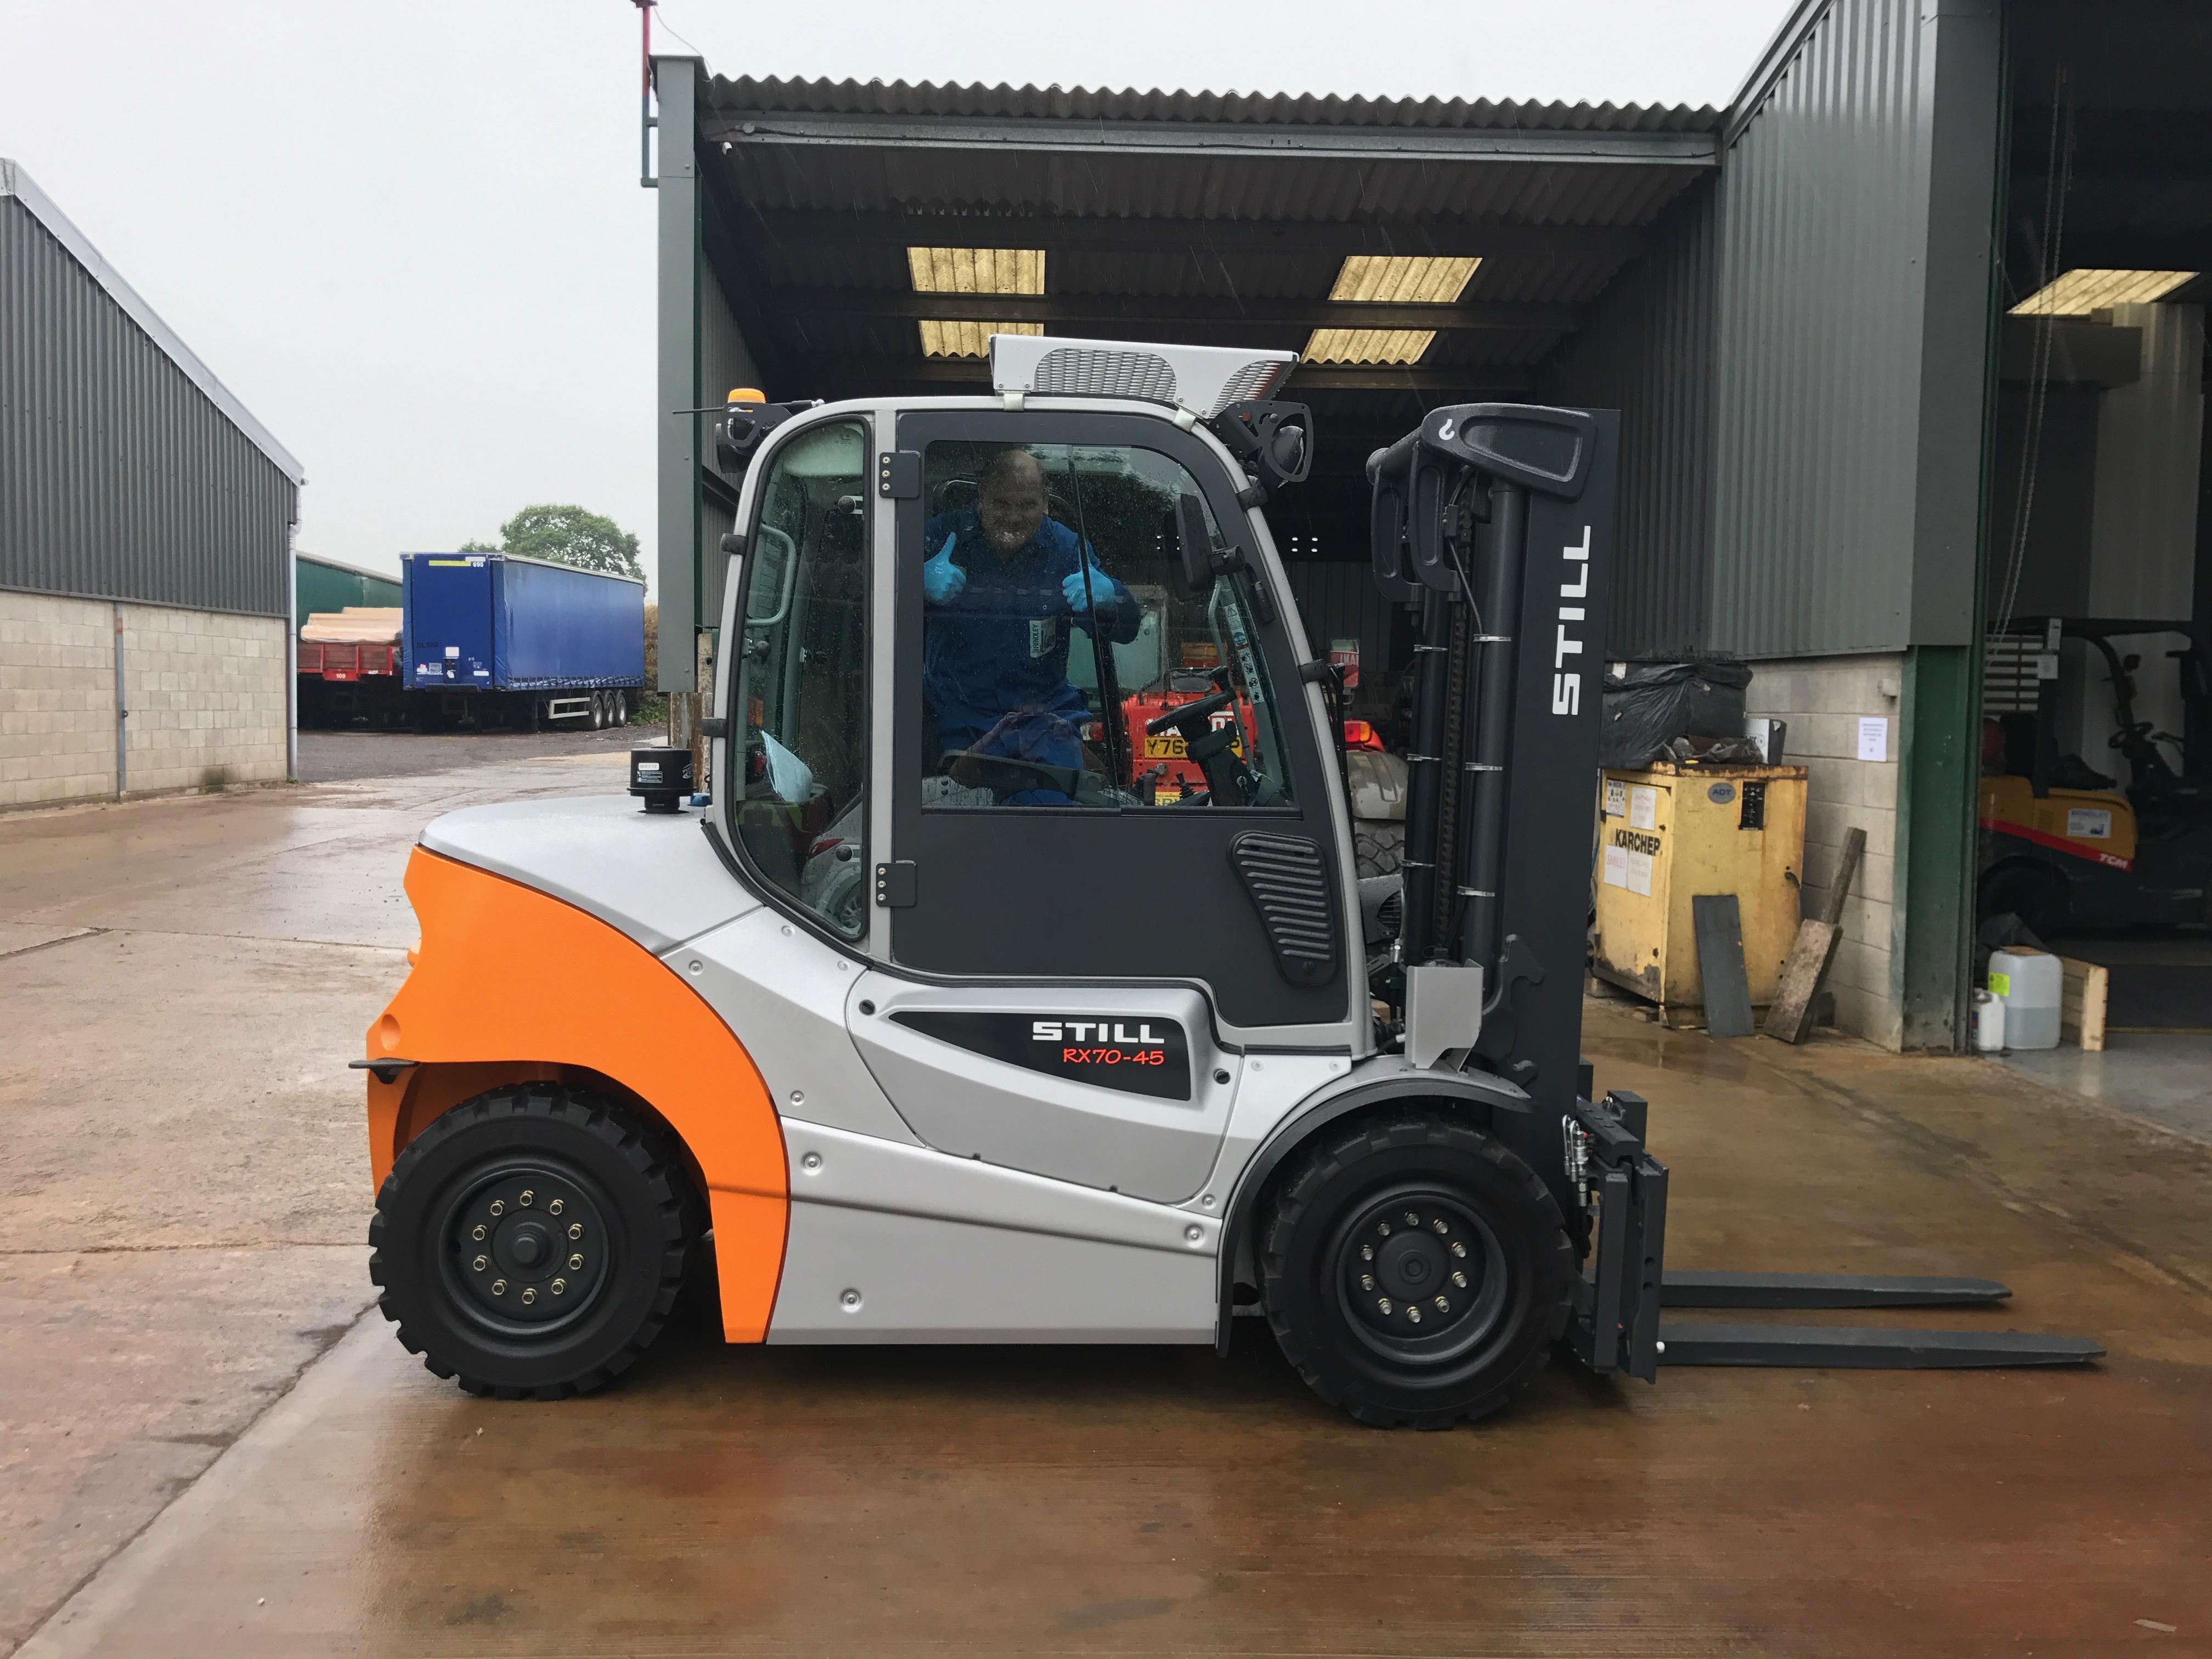 New lift trucks